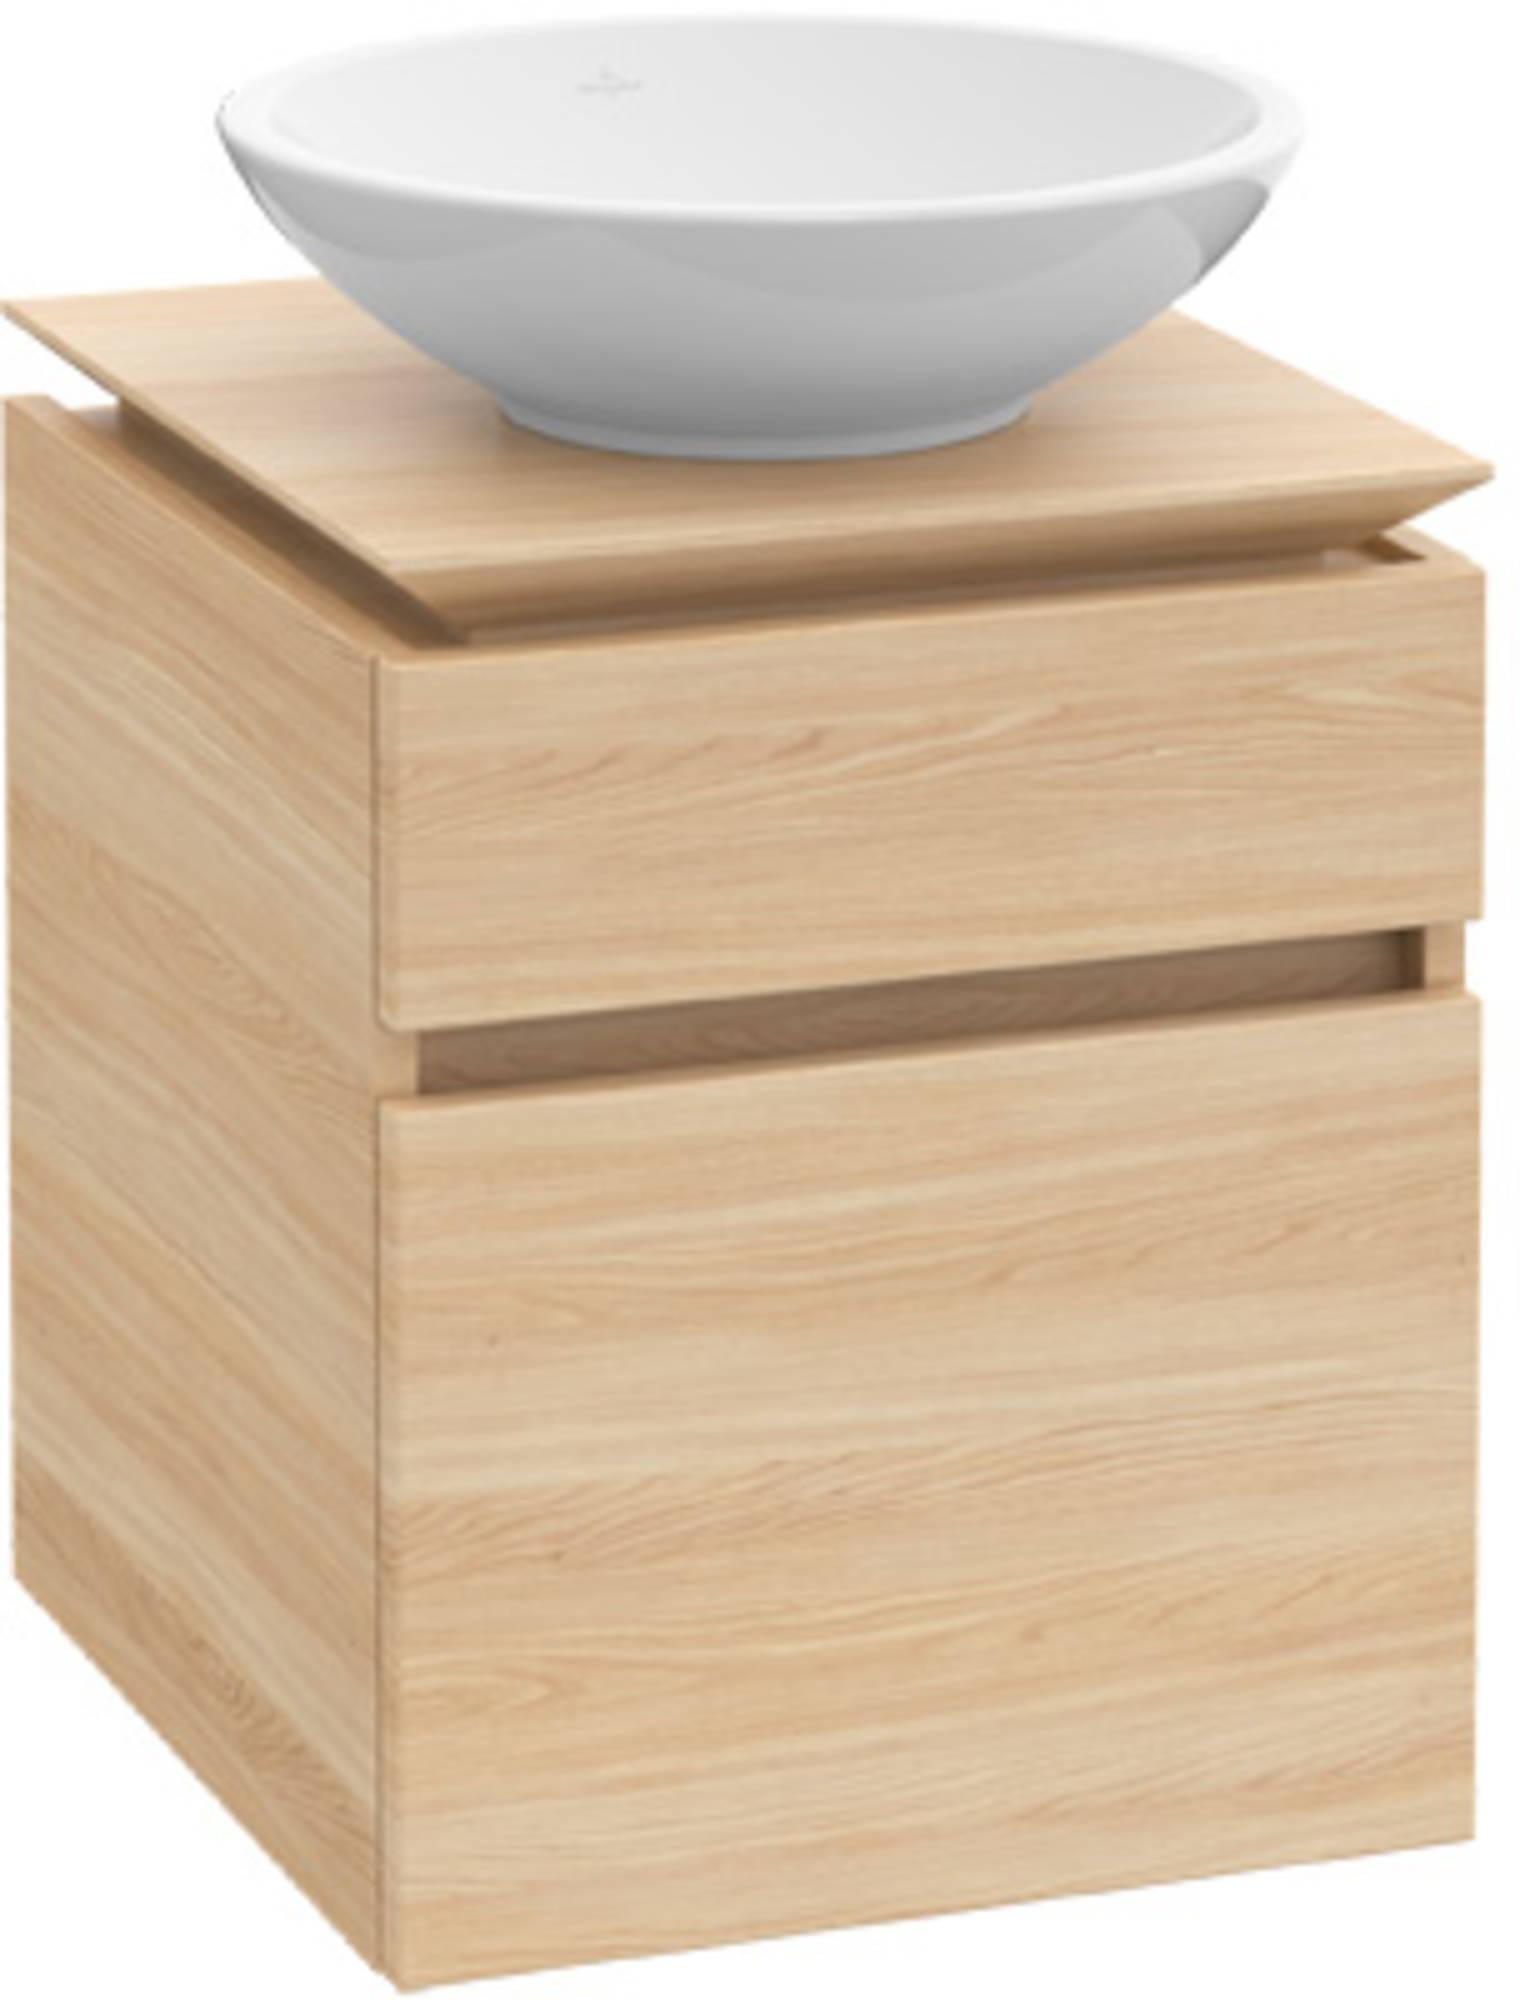 Villeroy&Boch Legato Wastafelonderkast 50x44x59 cm Santana Oak